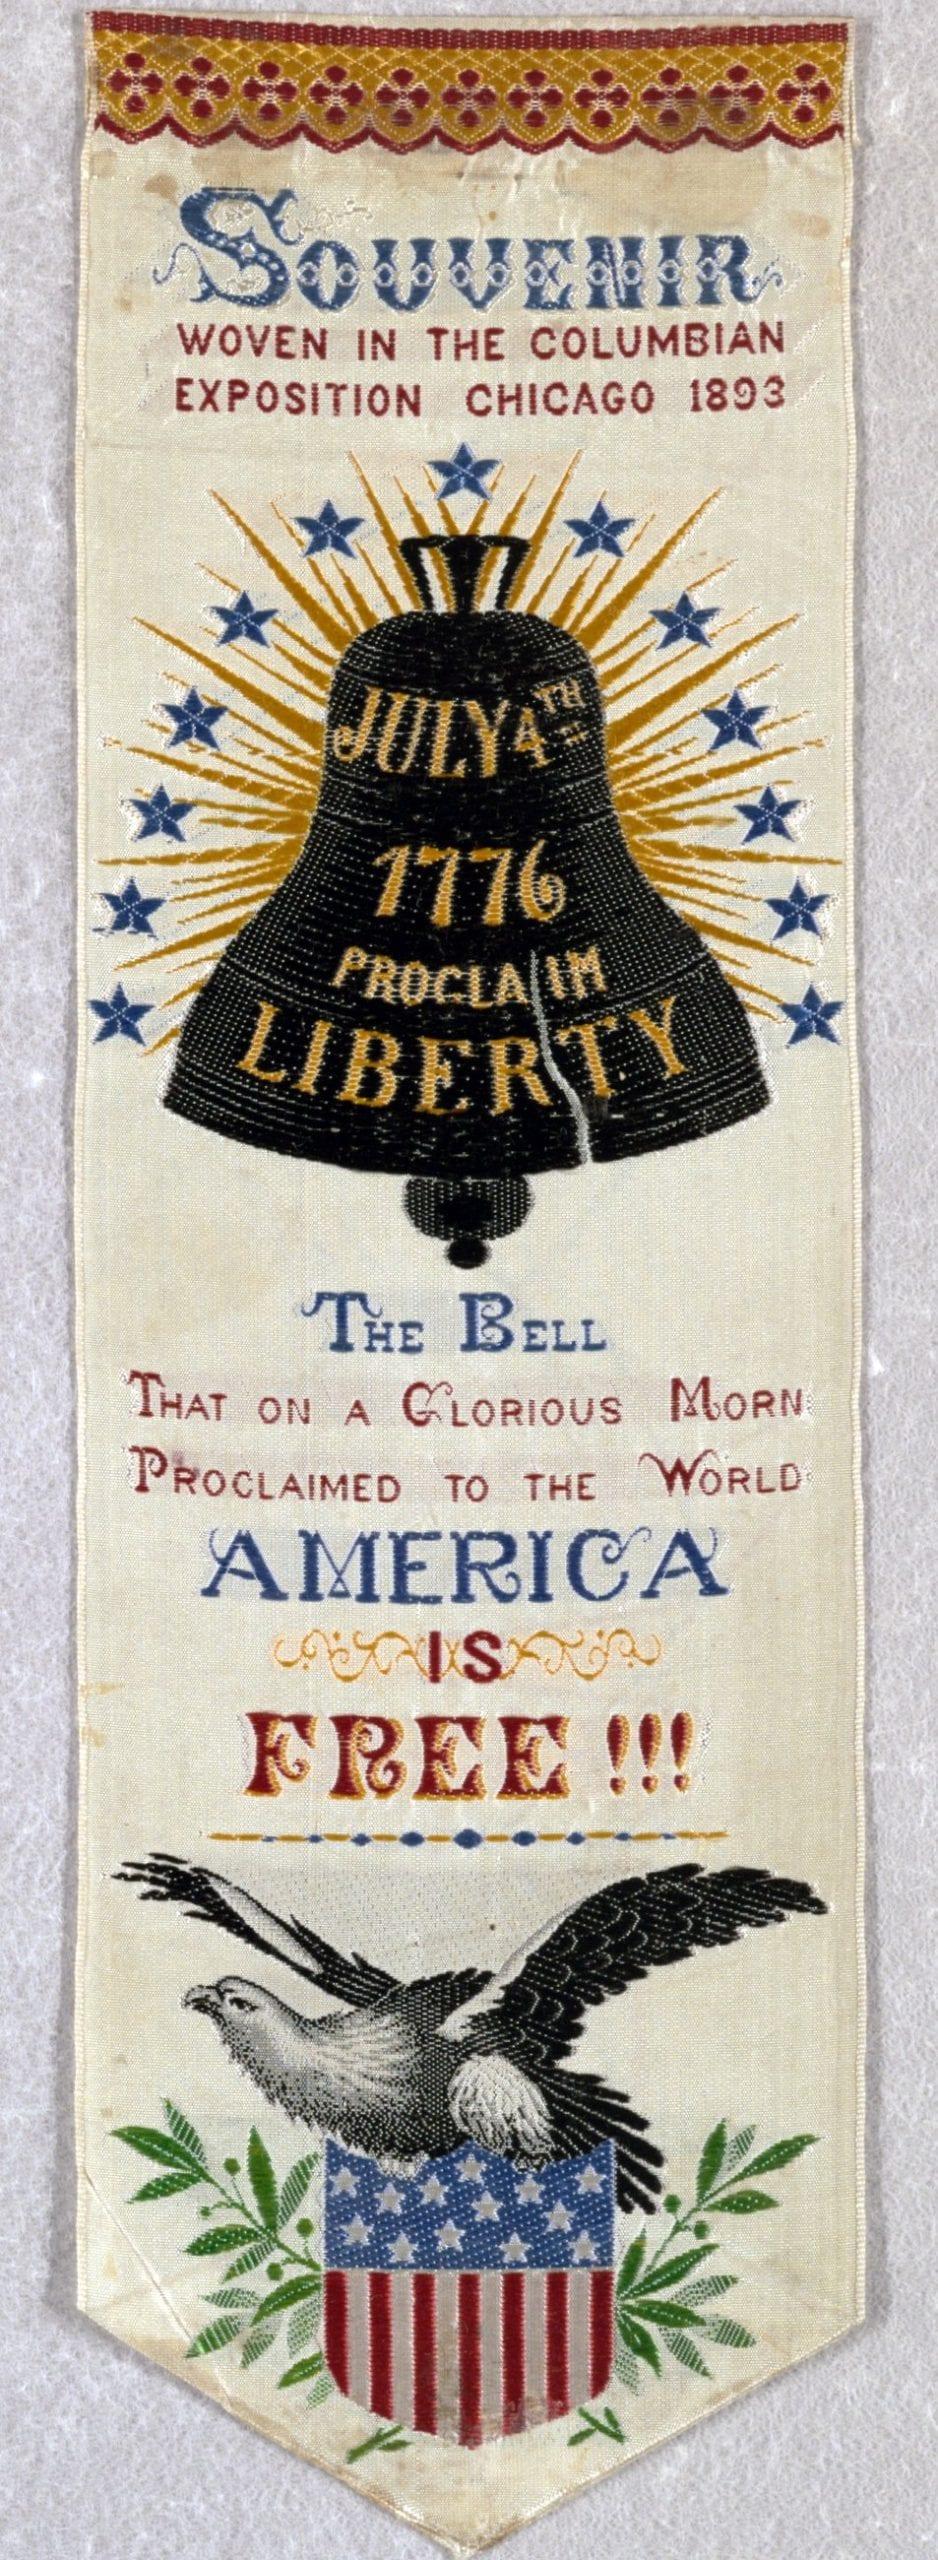 July 4th 1776 - Proclaim Liberty (1893) Ribbon banner